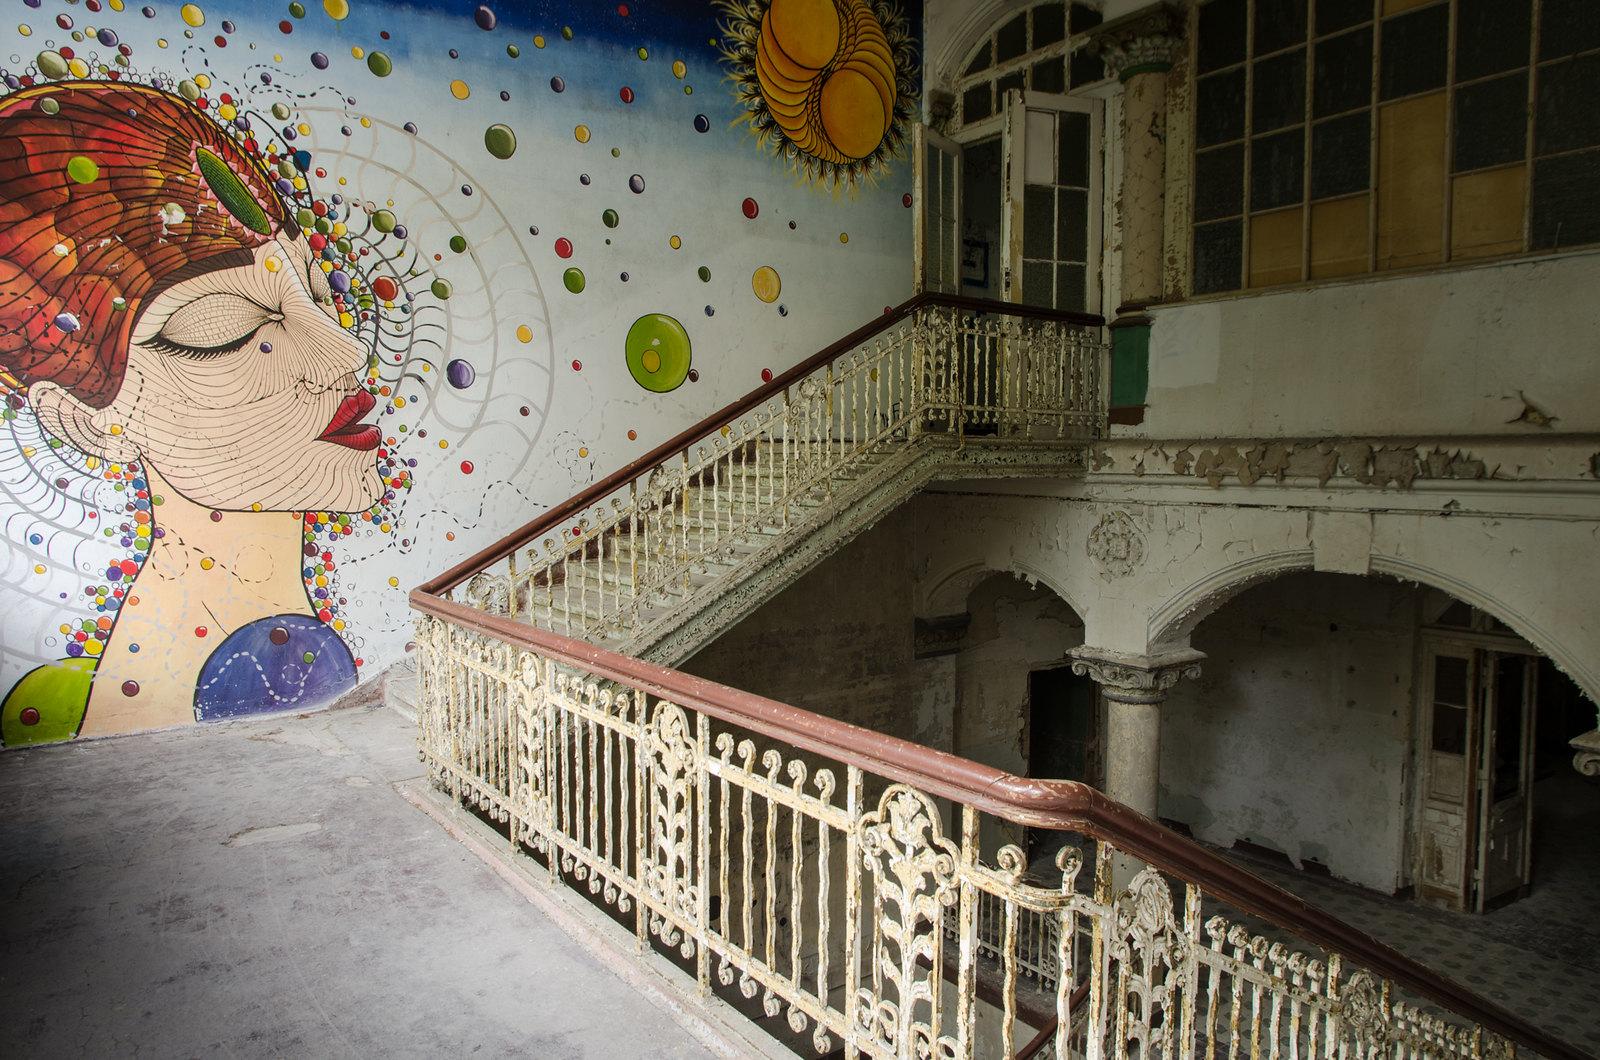 Urbex à Berlin - Le sanatorium de Beelitz-Heilstatten